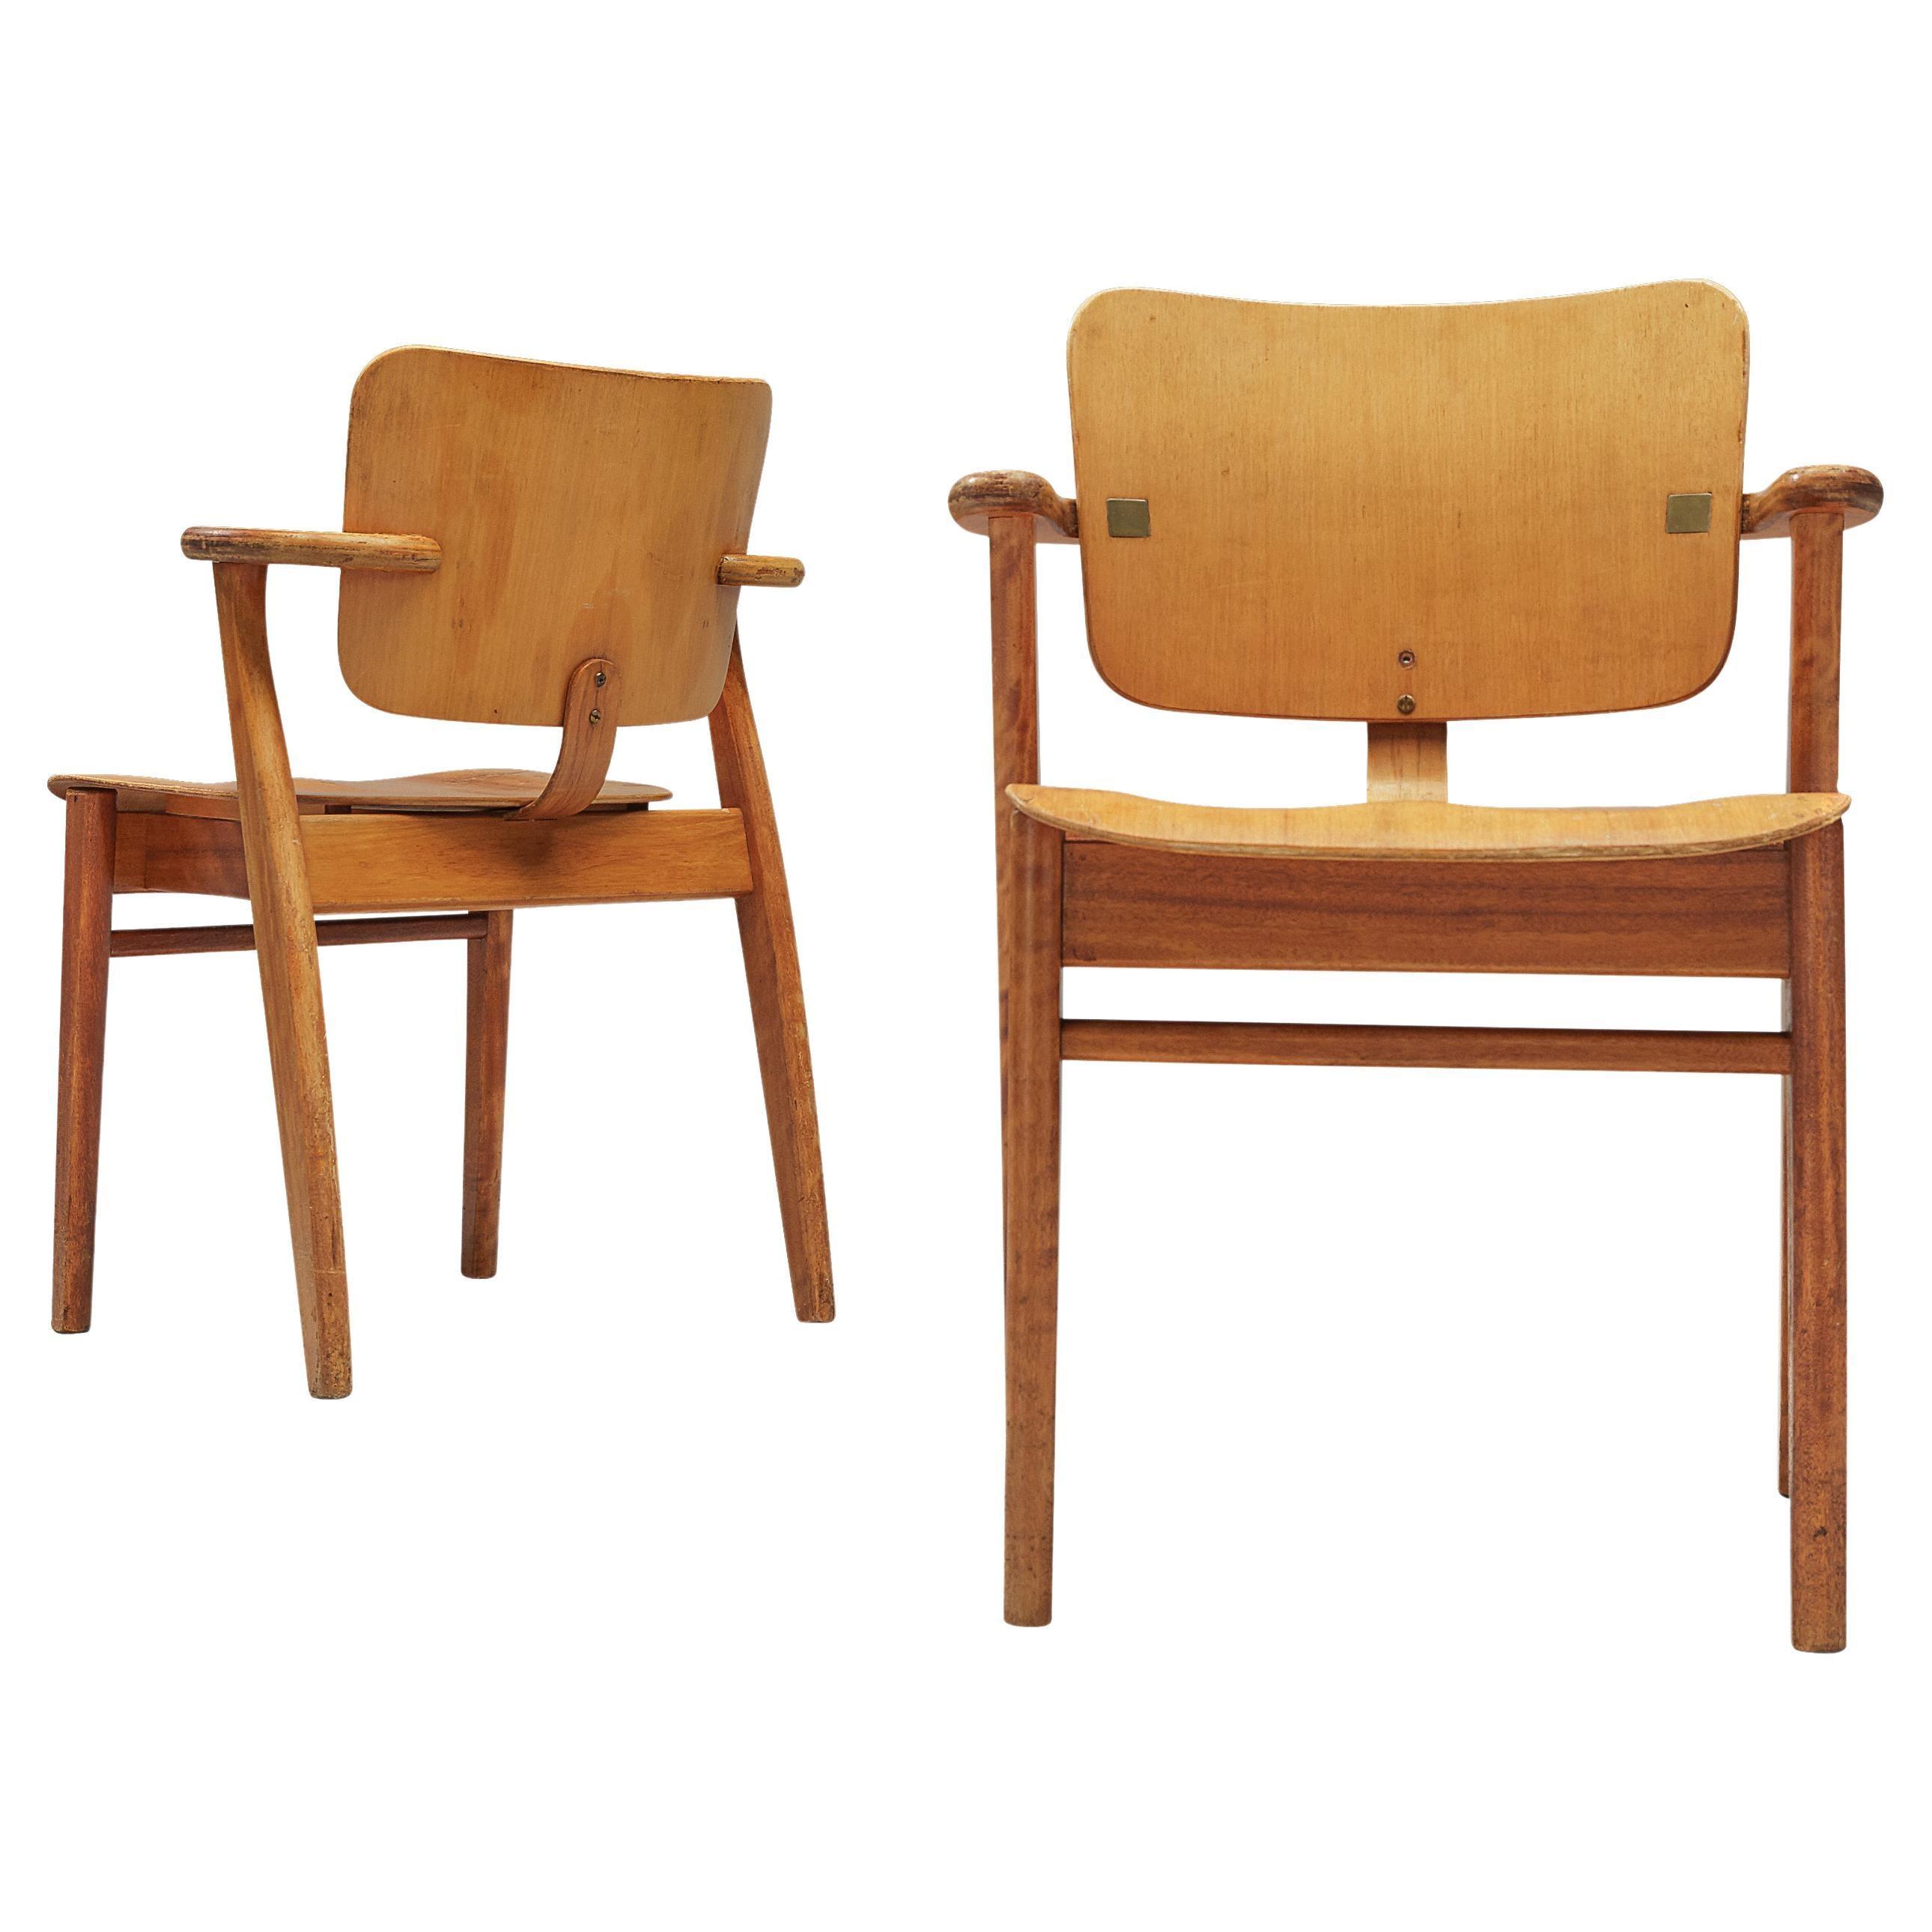 Ilmari Tapiovaara Pair of 'Domus' Dining Chairs in Birch